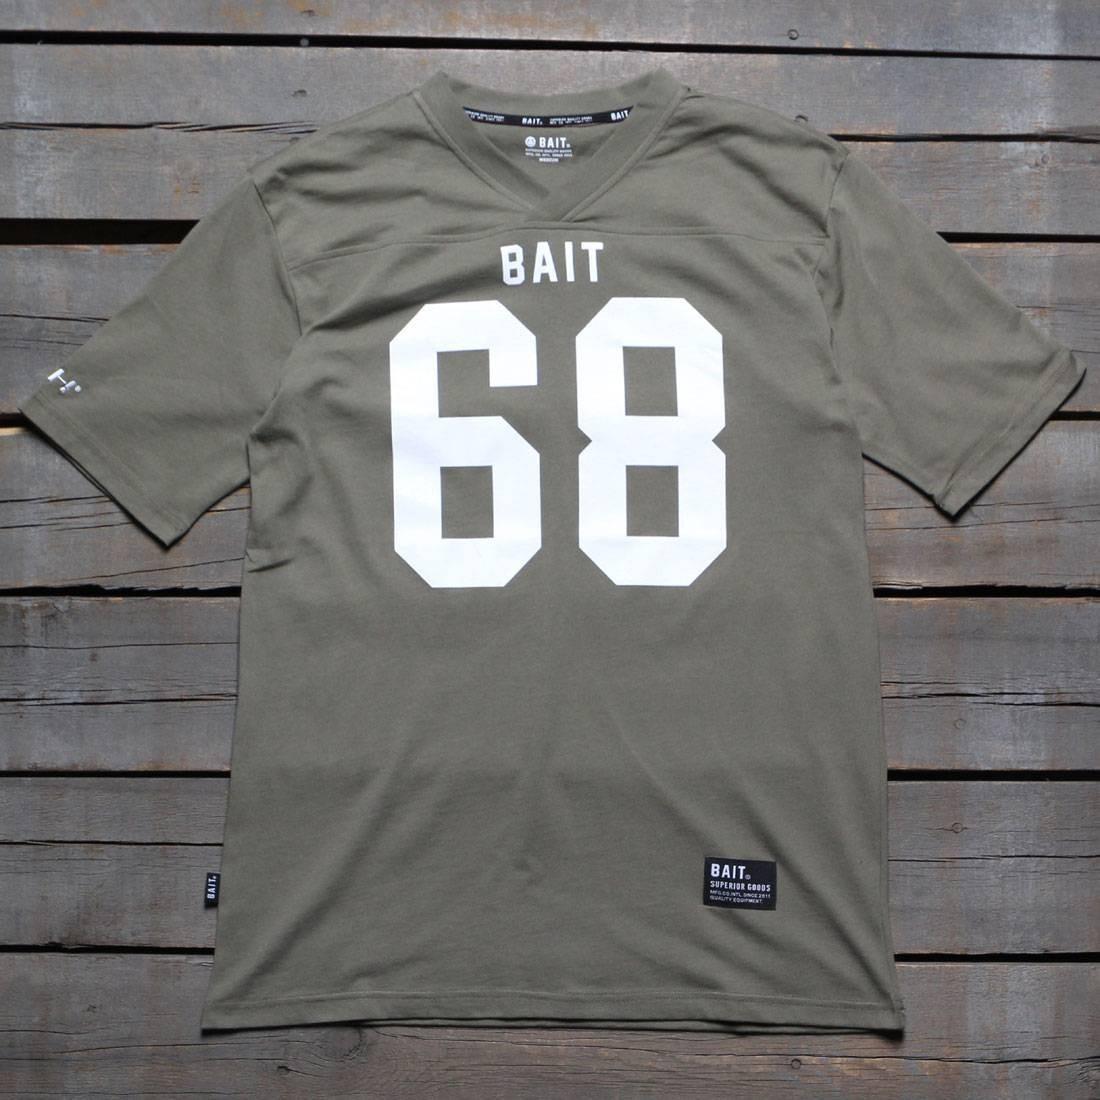 BAIT Men 68 Football Tee (green / army green)